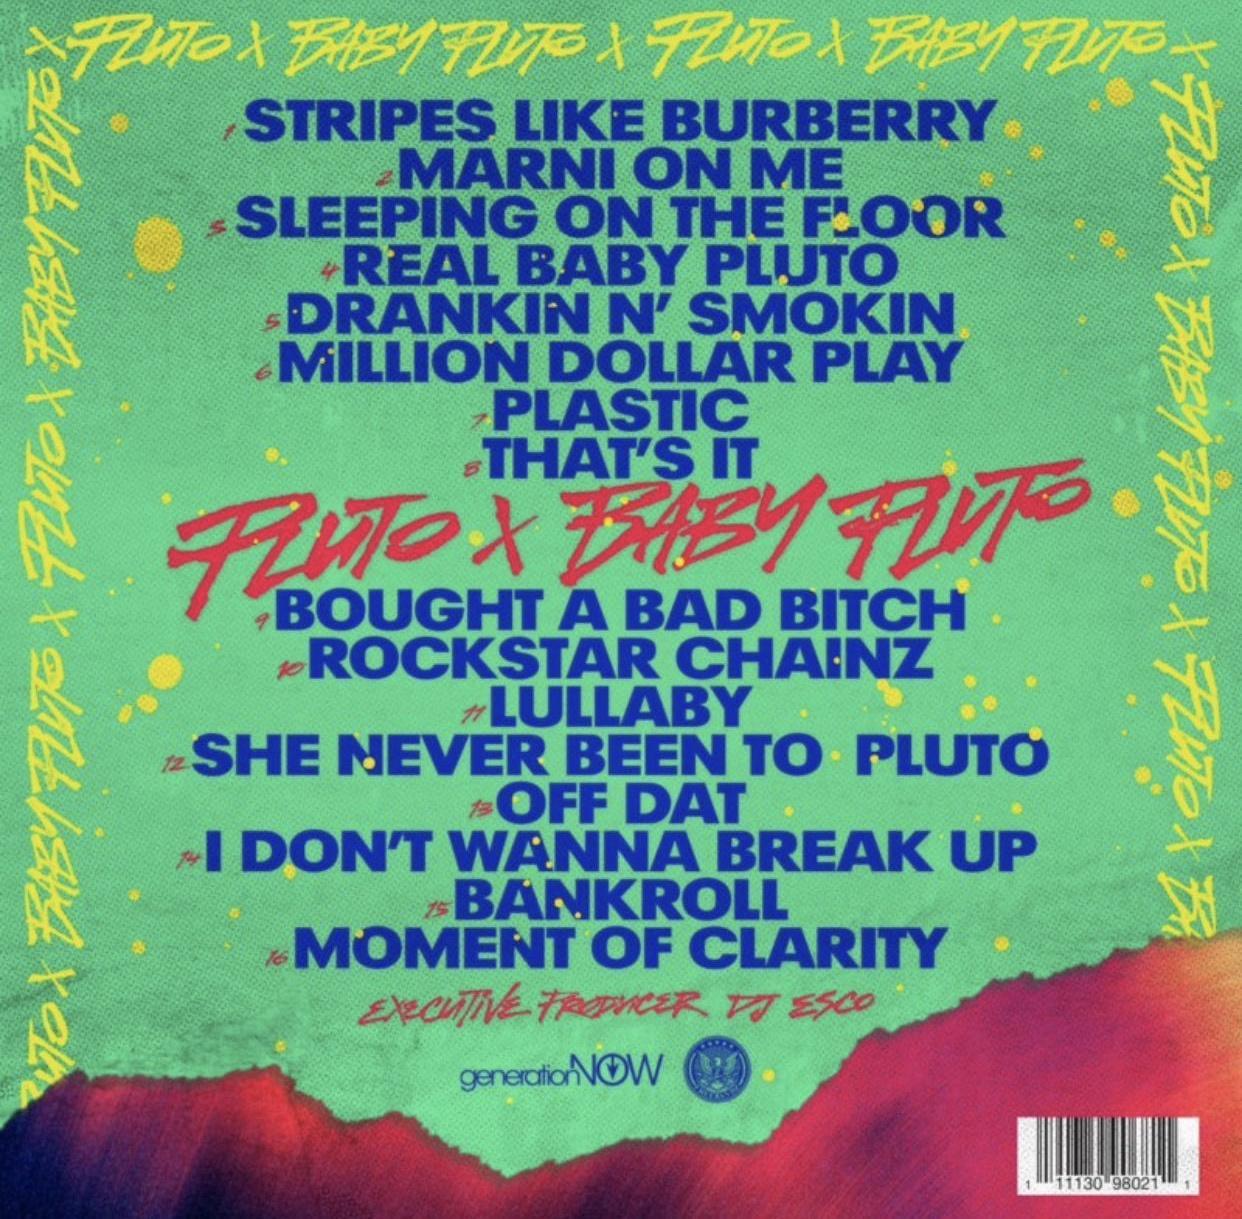 'Pluto x Baby Pluto' Album tracklist